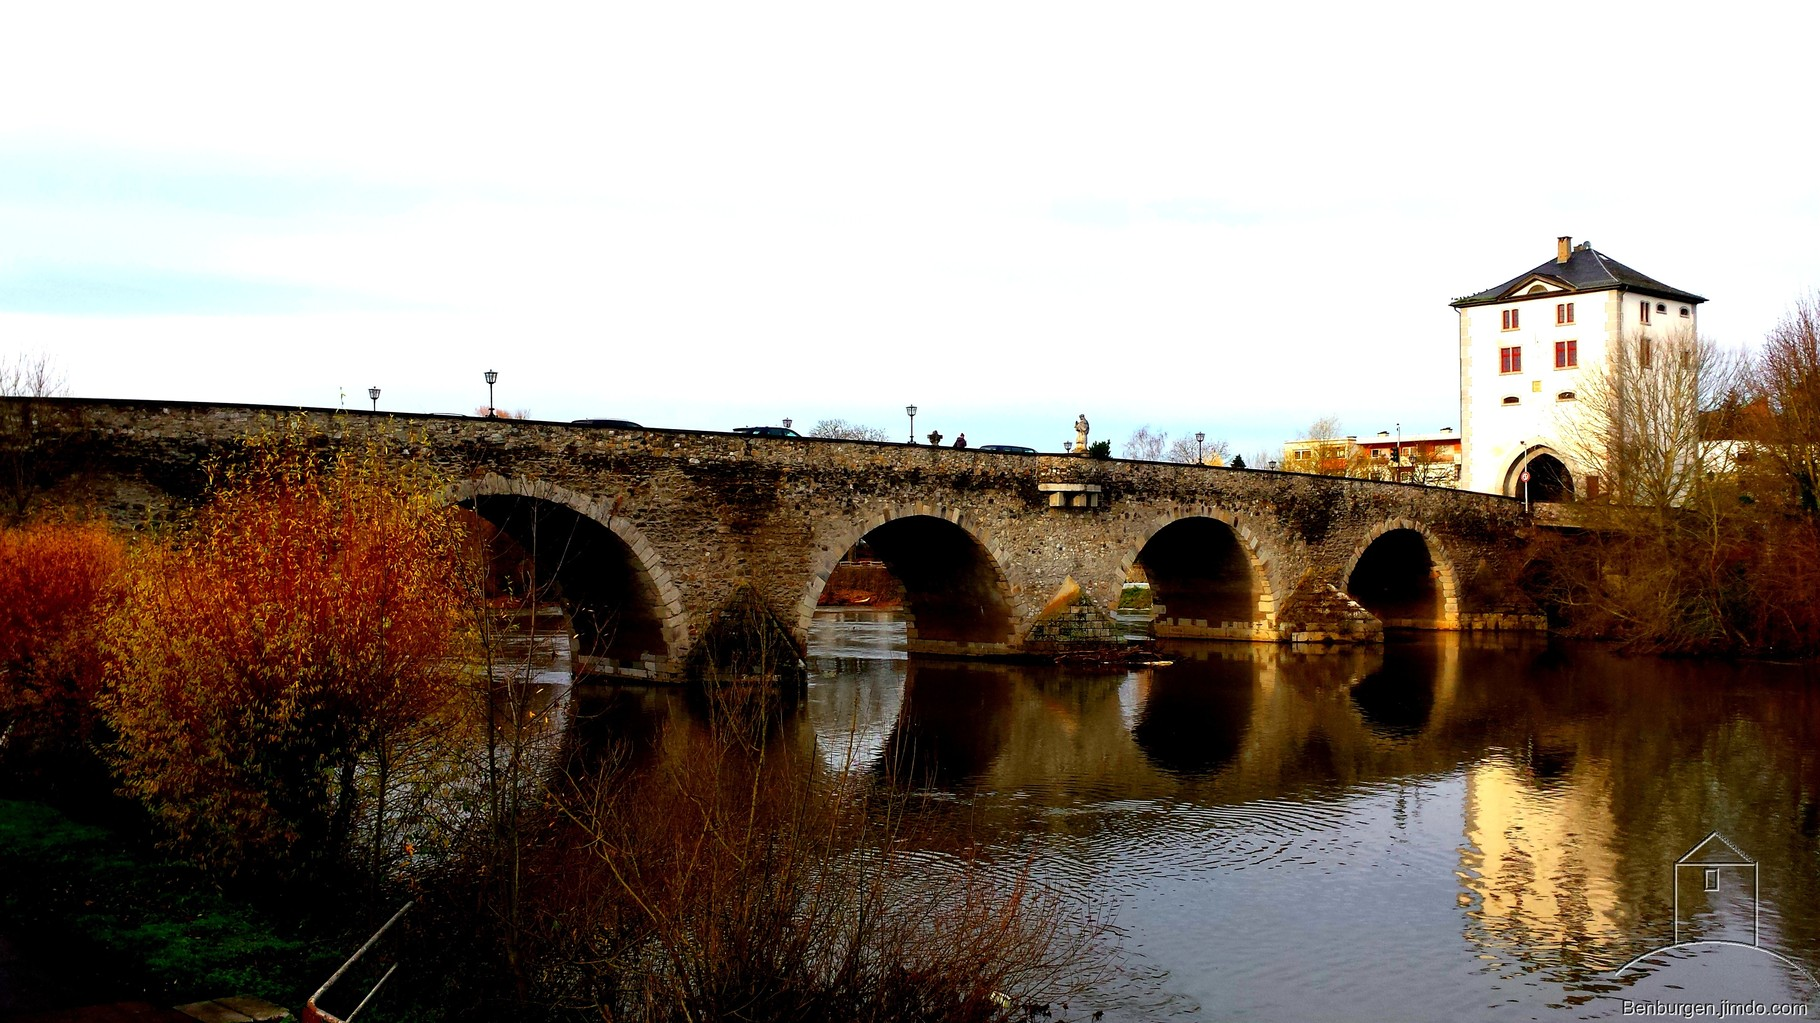 Bogenbrücke über die Lahn.